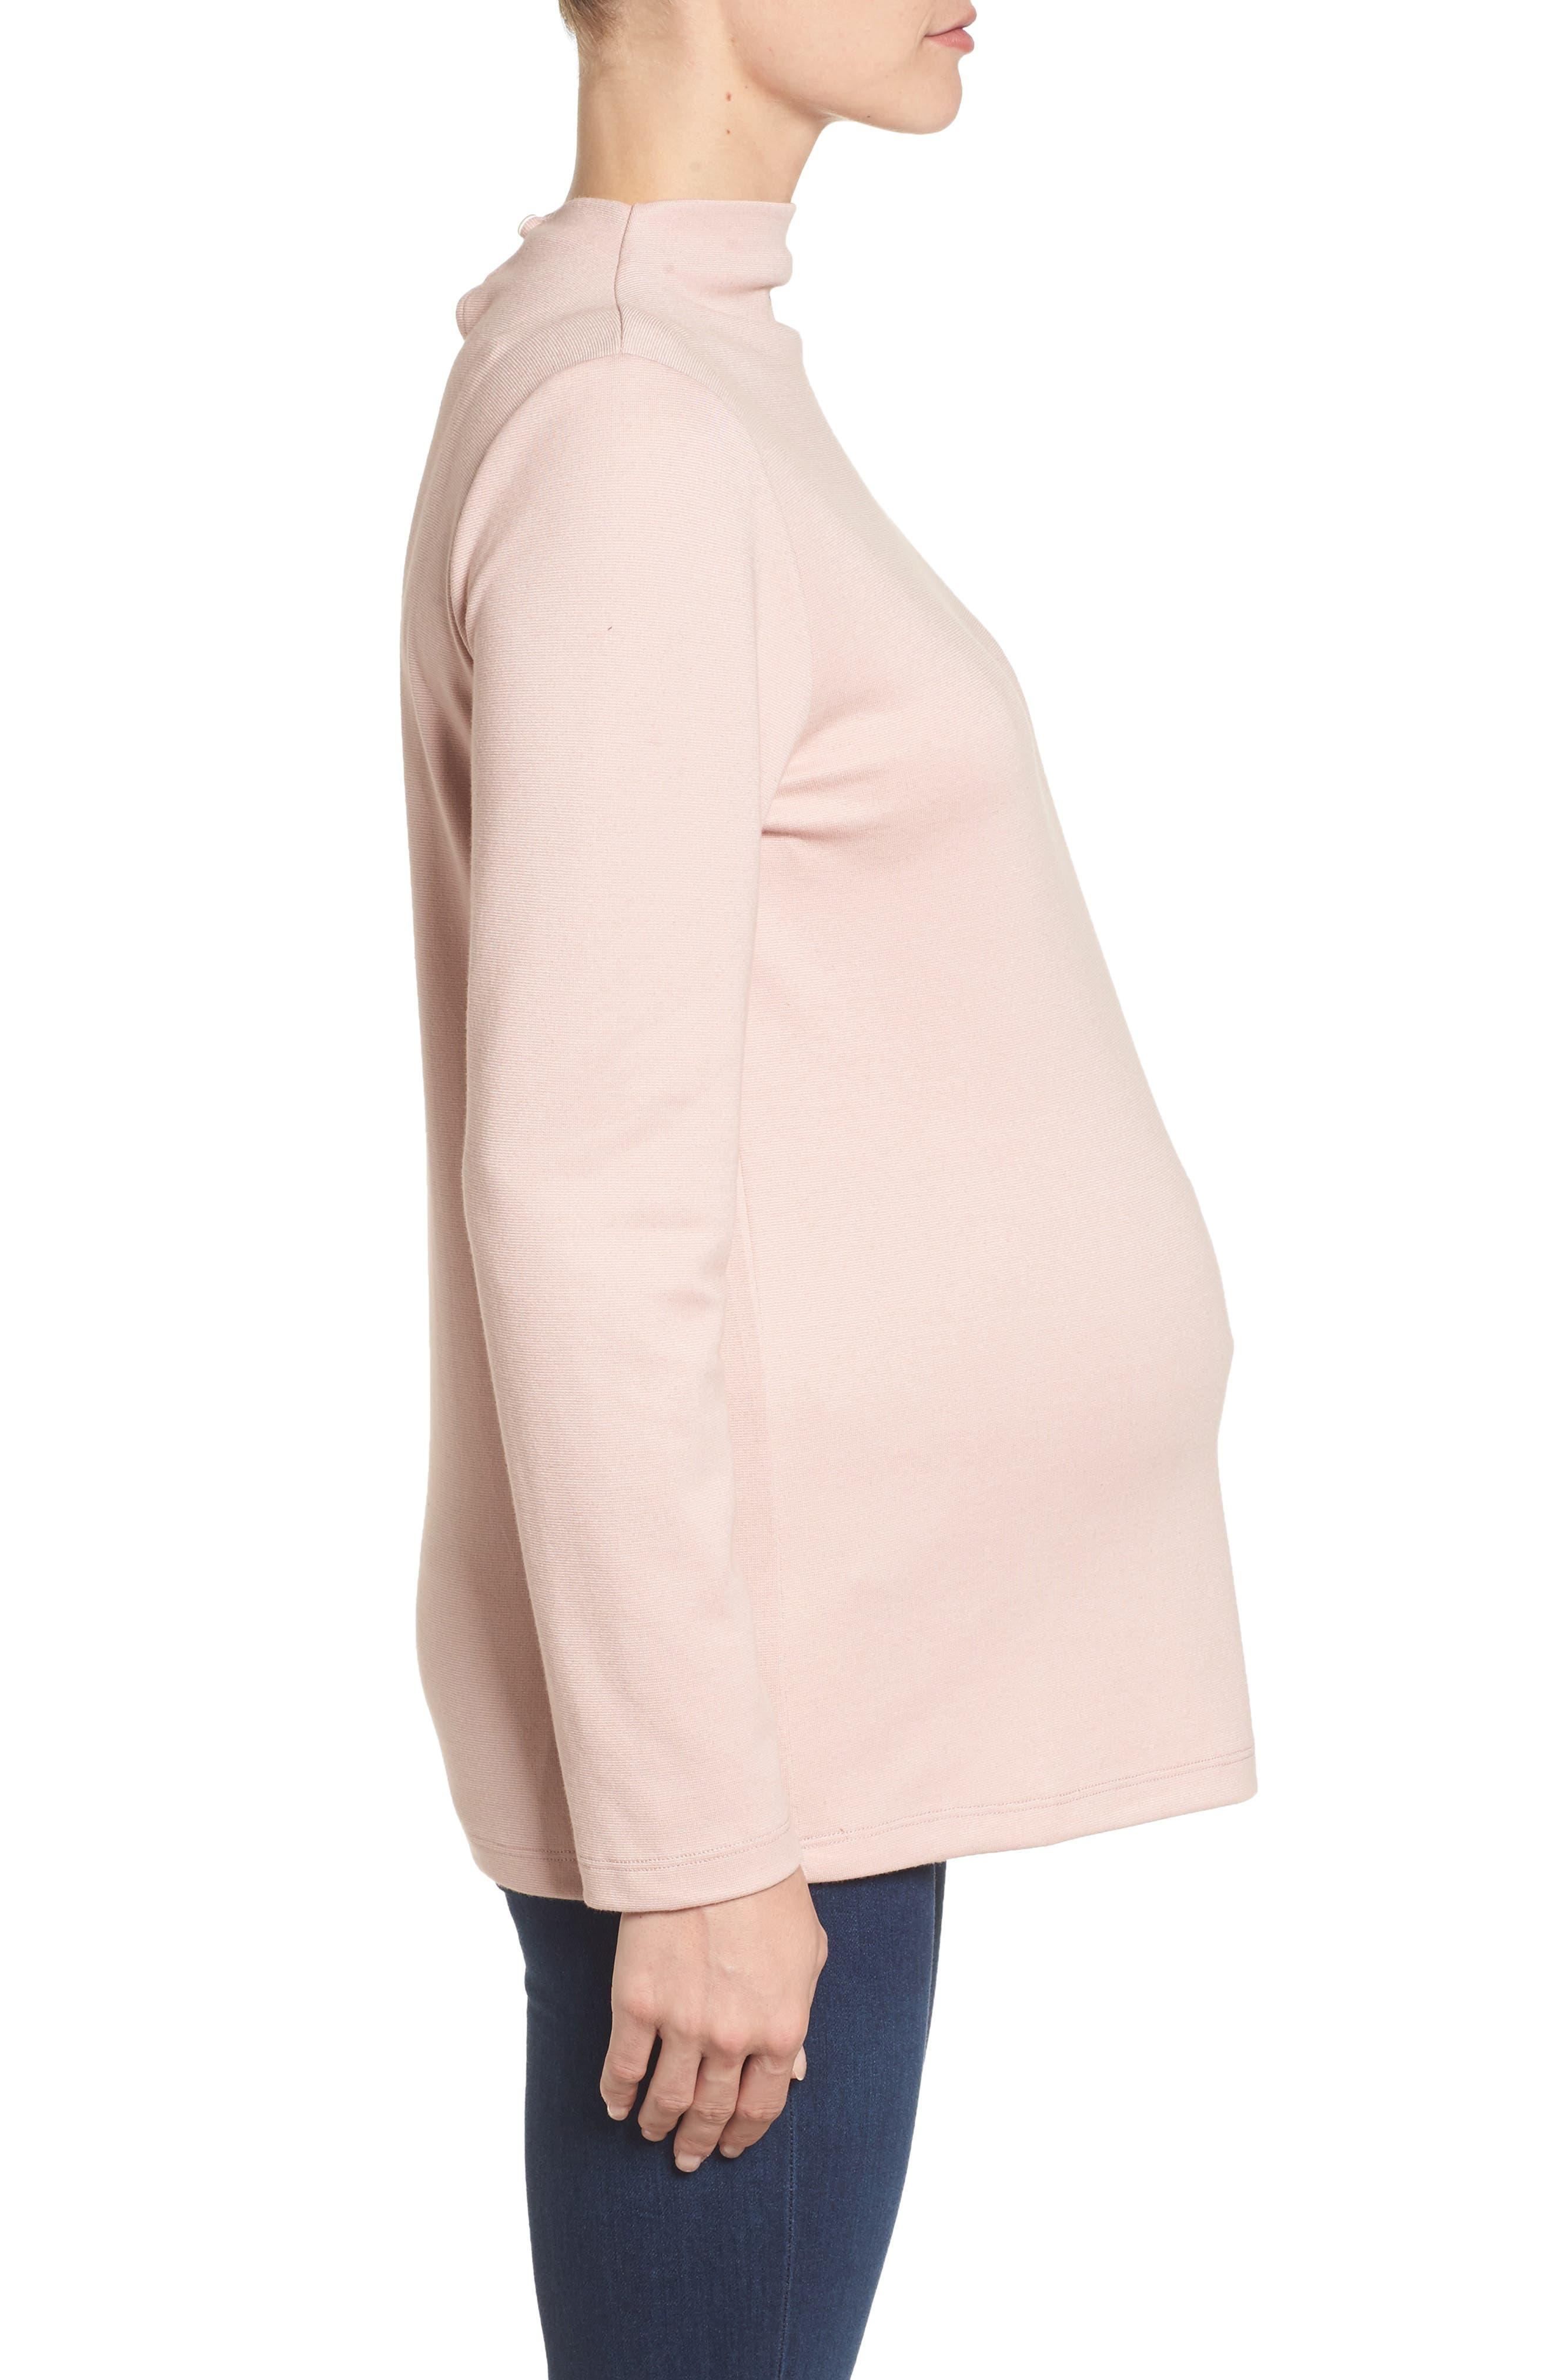 Alternate Image 3  - LAB40 Leah Maternity Top